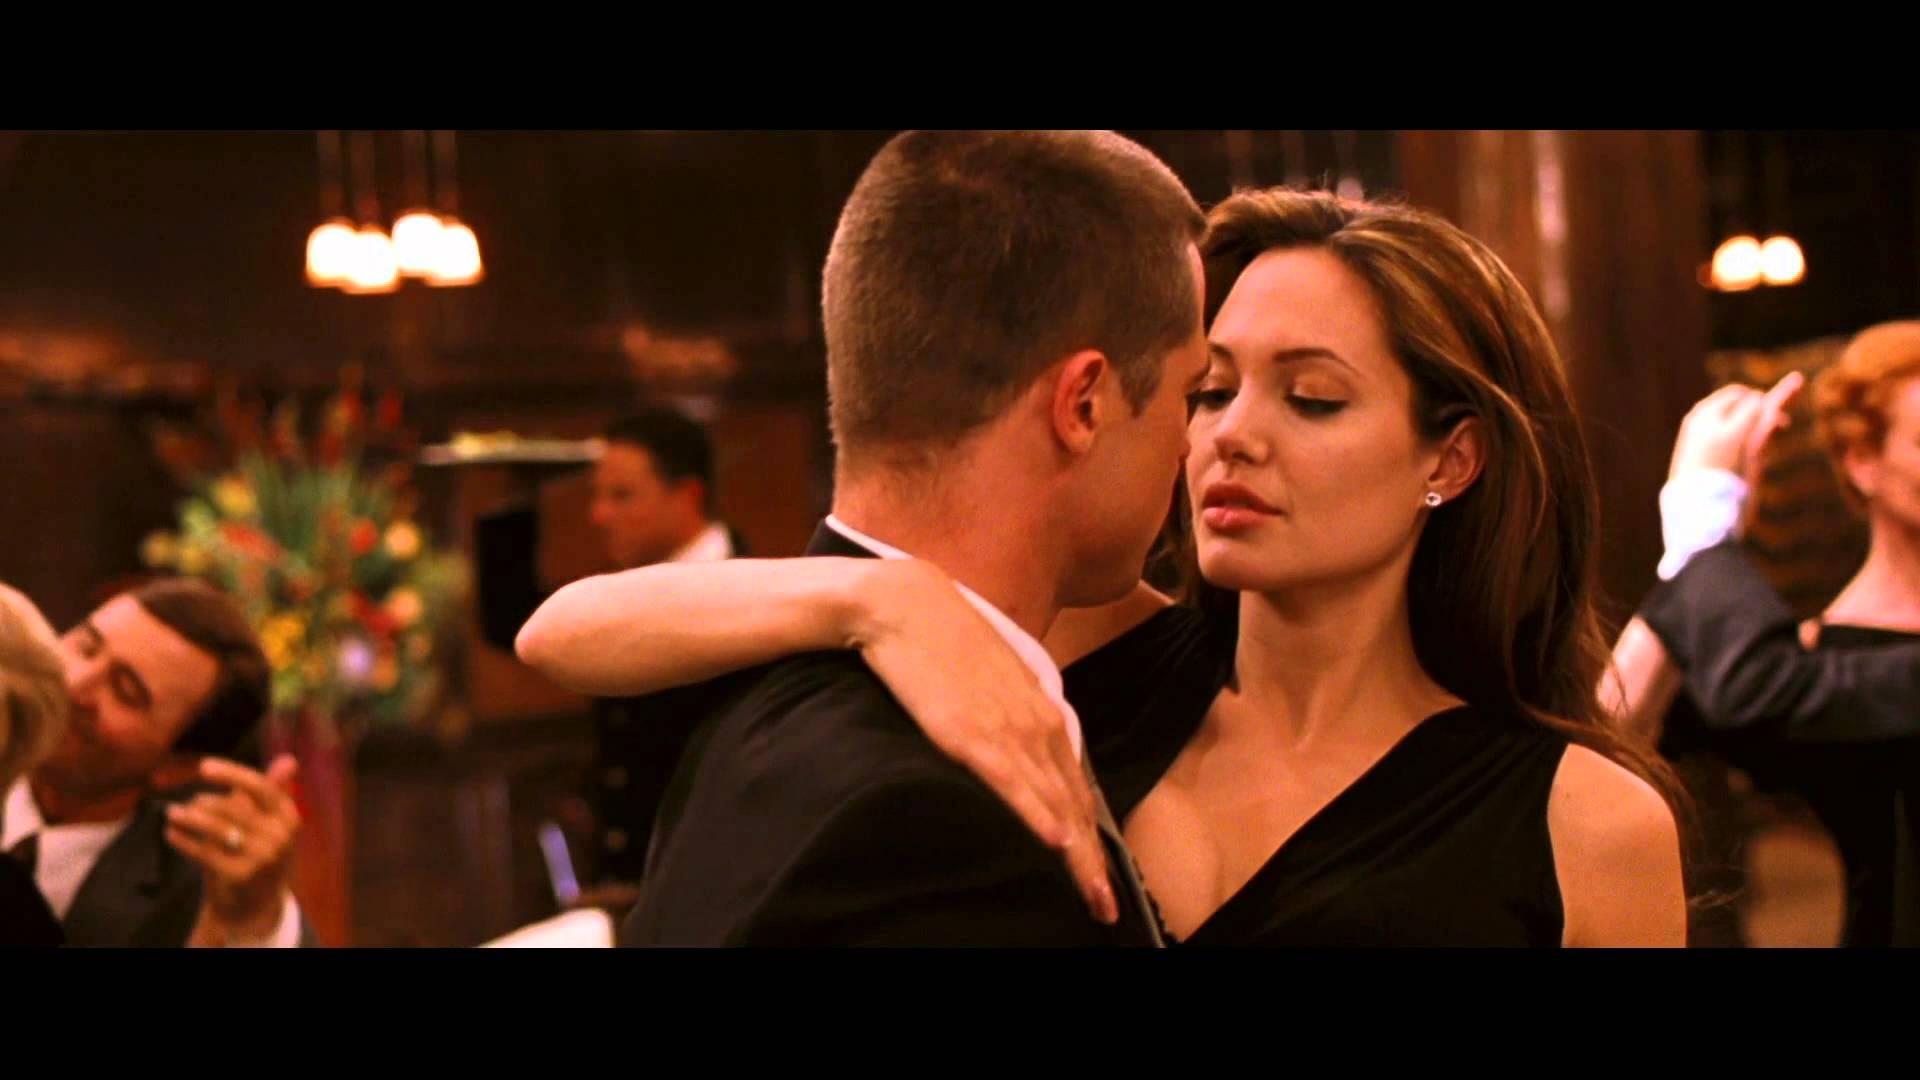 Angelina Jolie, Being Single Is Just Too Hard...